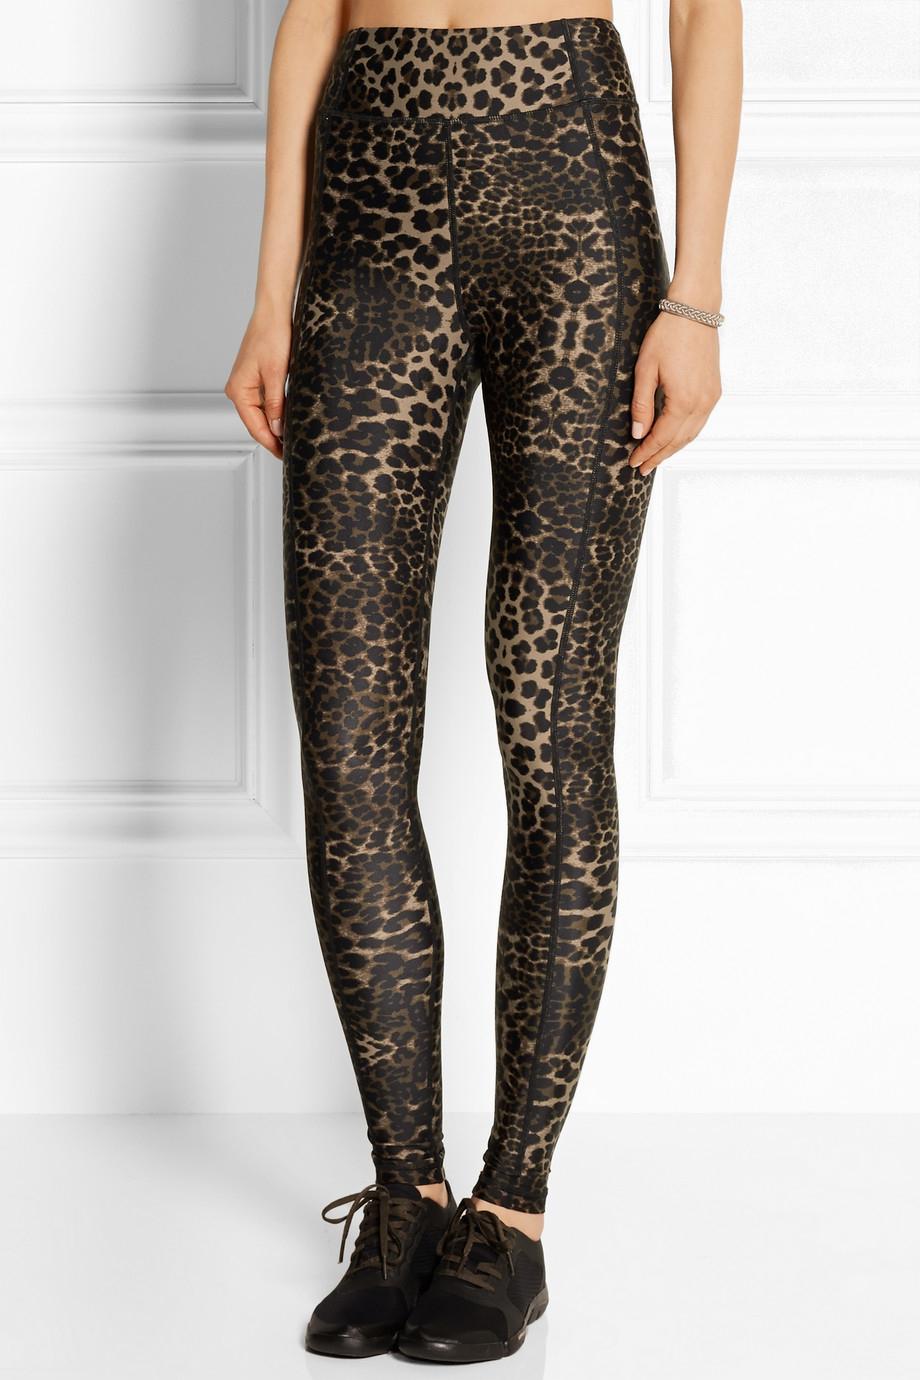 Lyst The Upside Dance Leopard Print Stretch Jersey Leggings